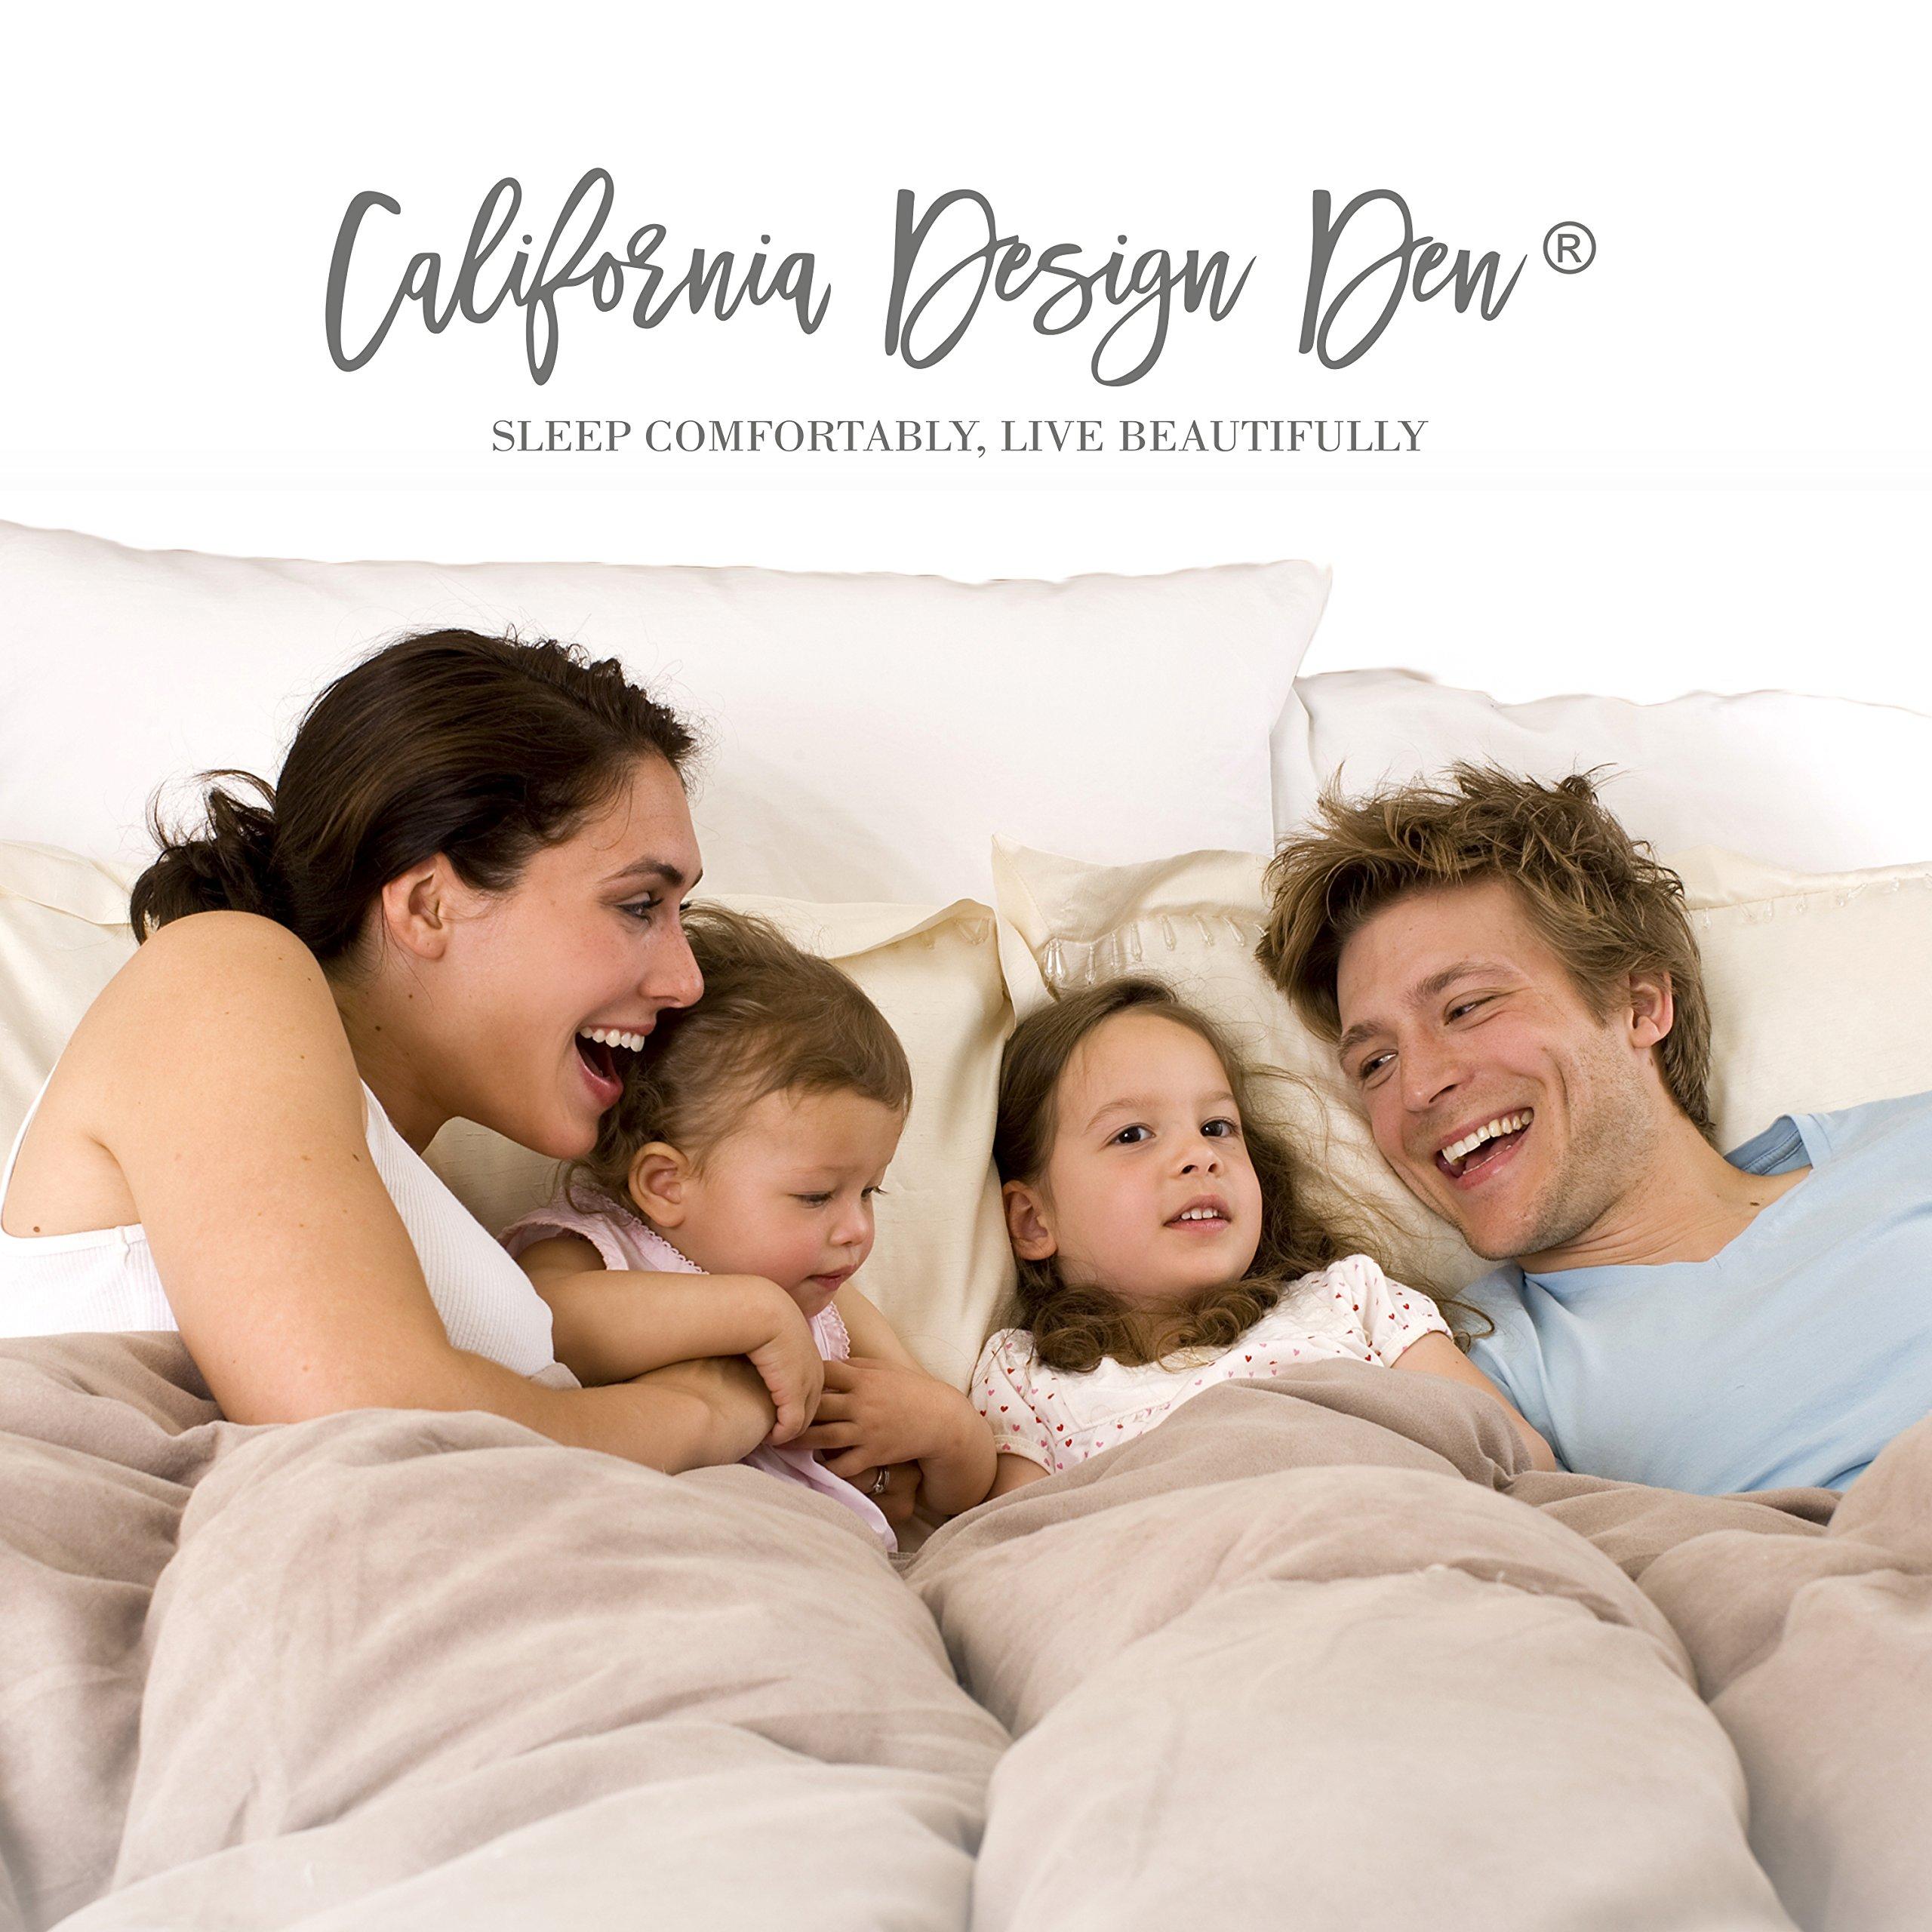 California Design Den Quilt Set, Light Grey, Full/Queen